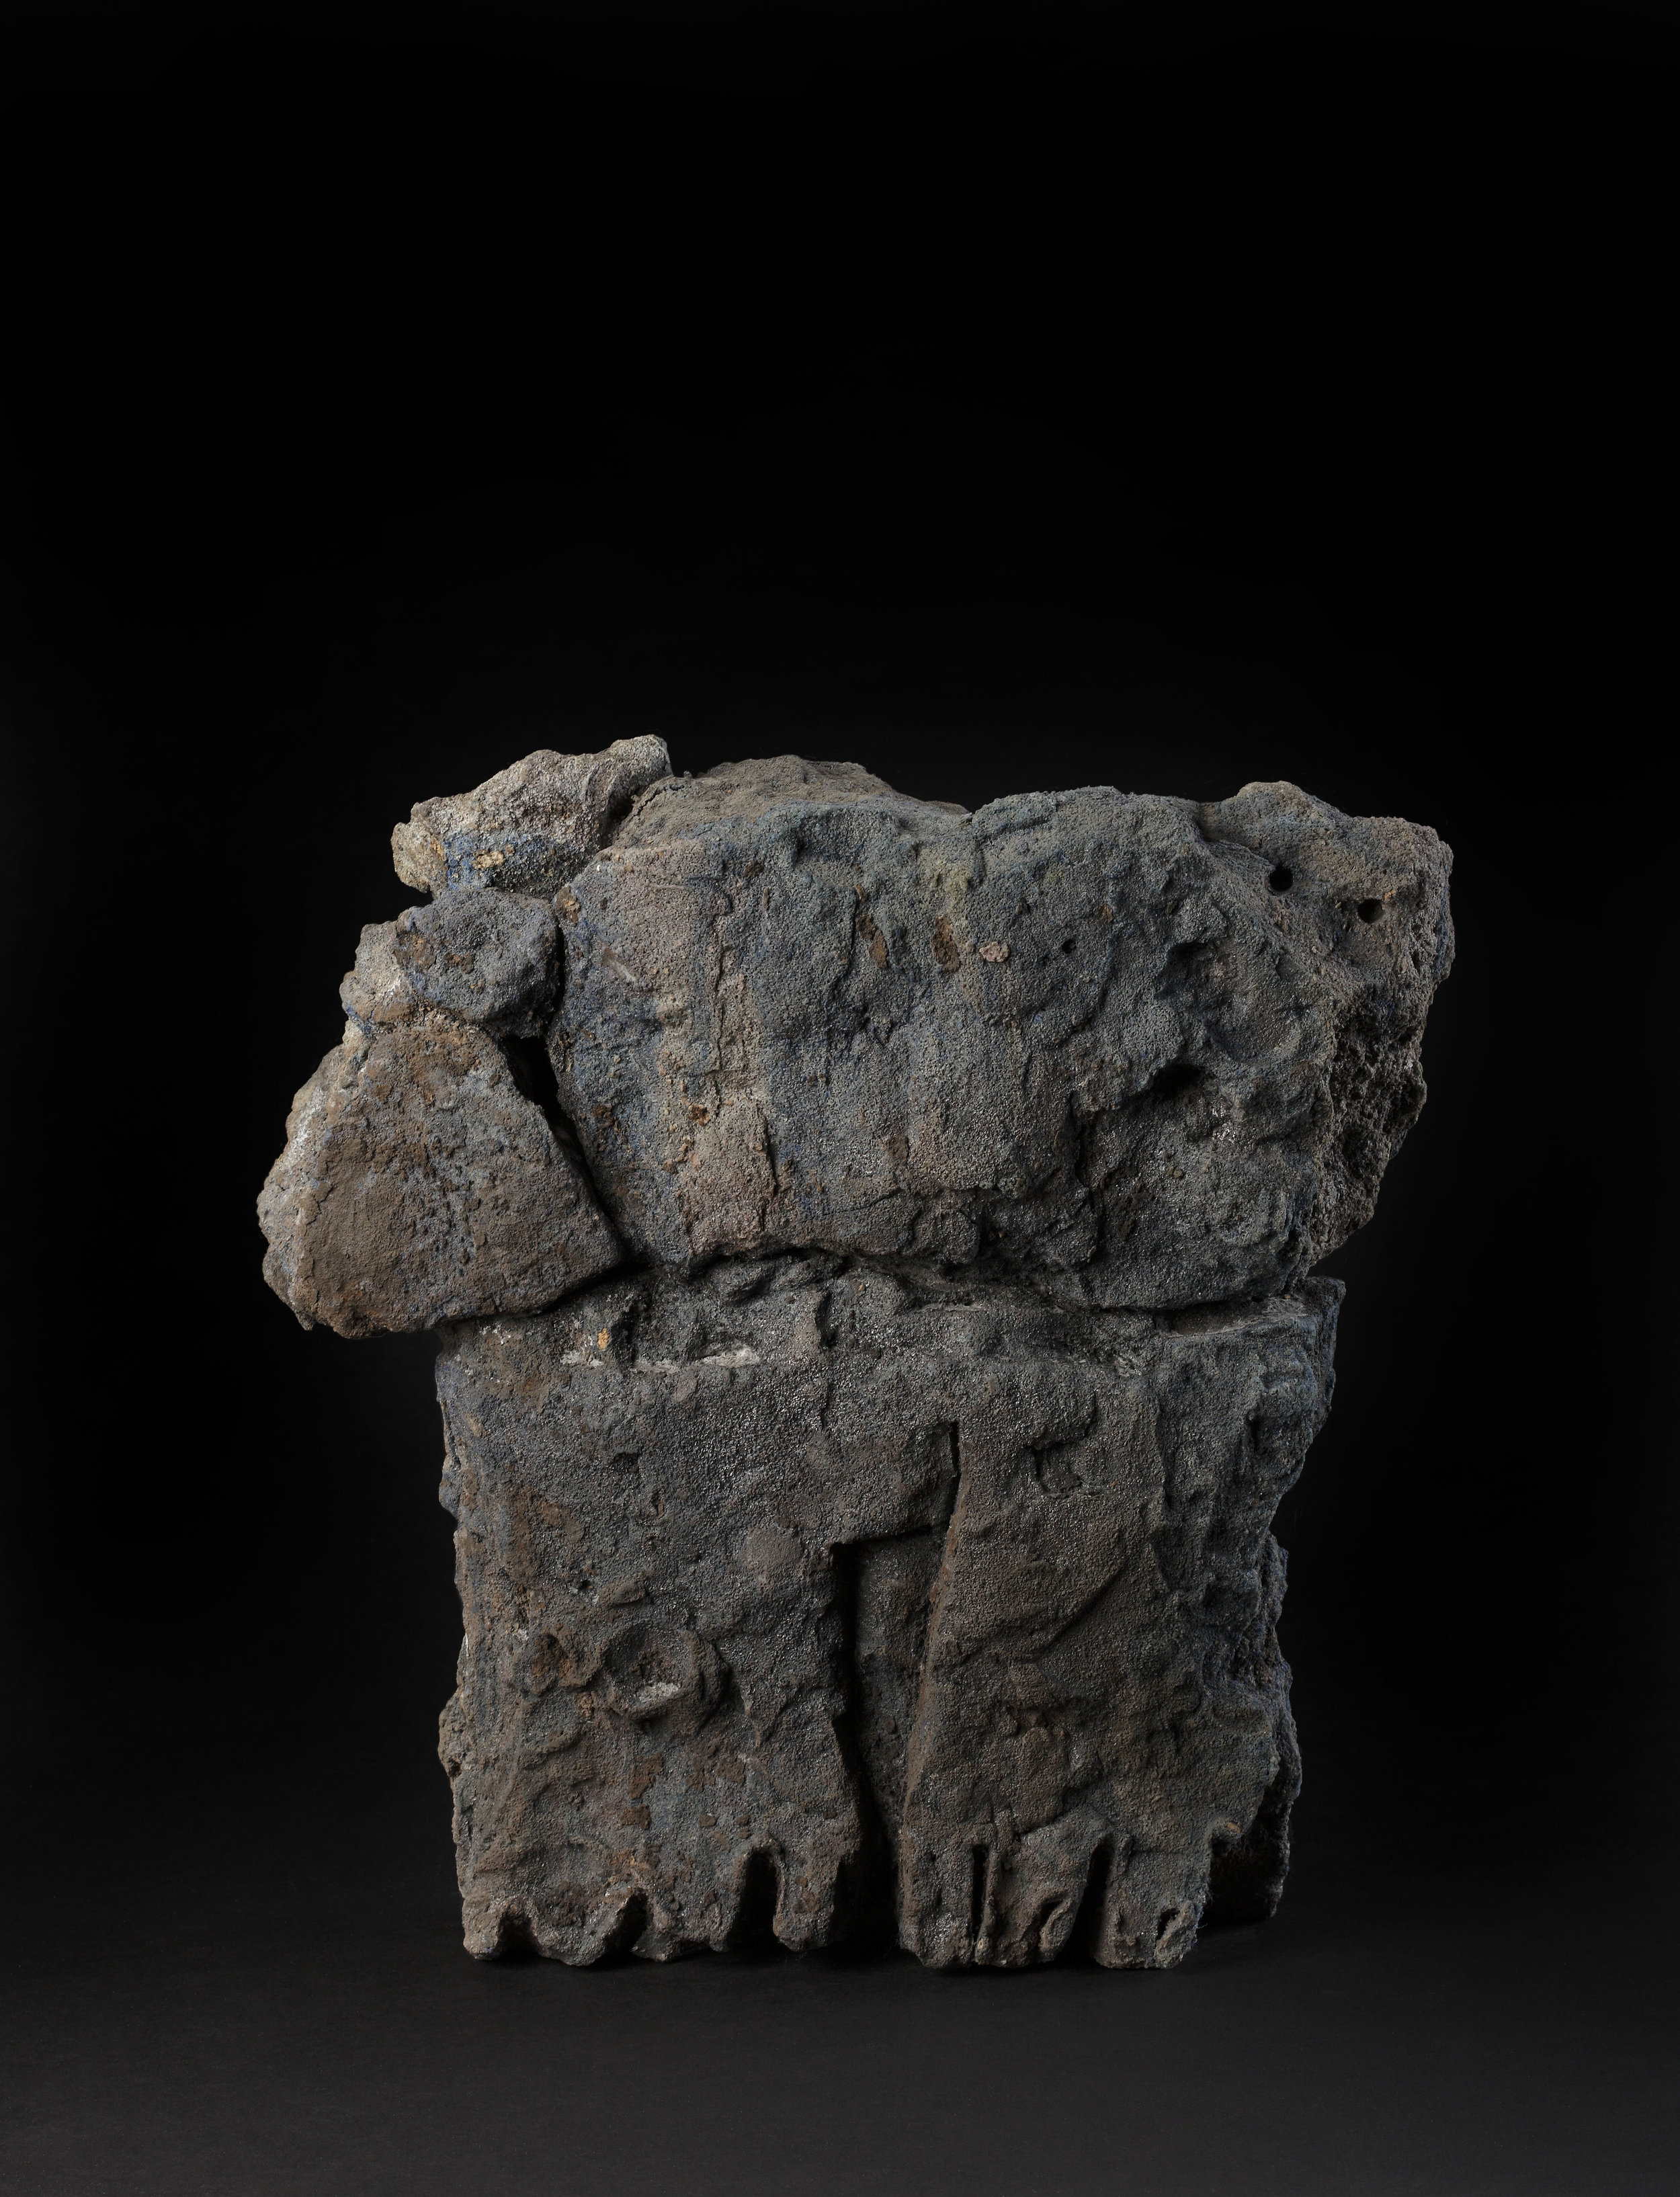 Geologic formation